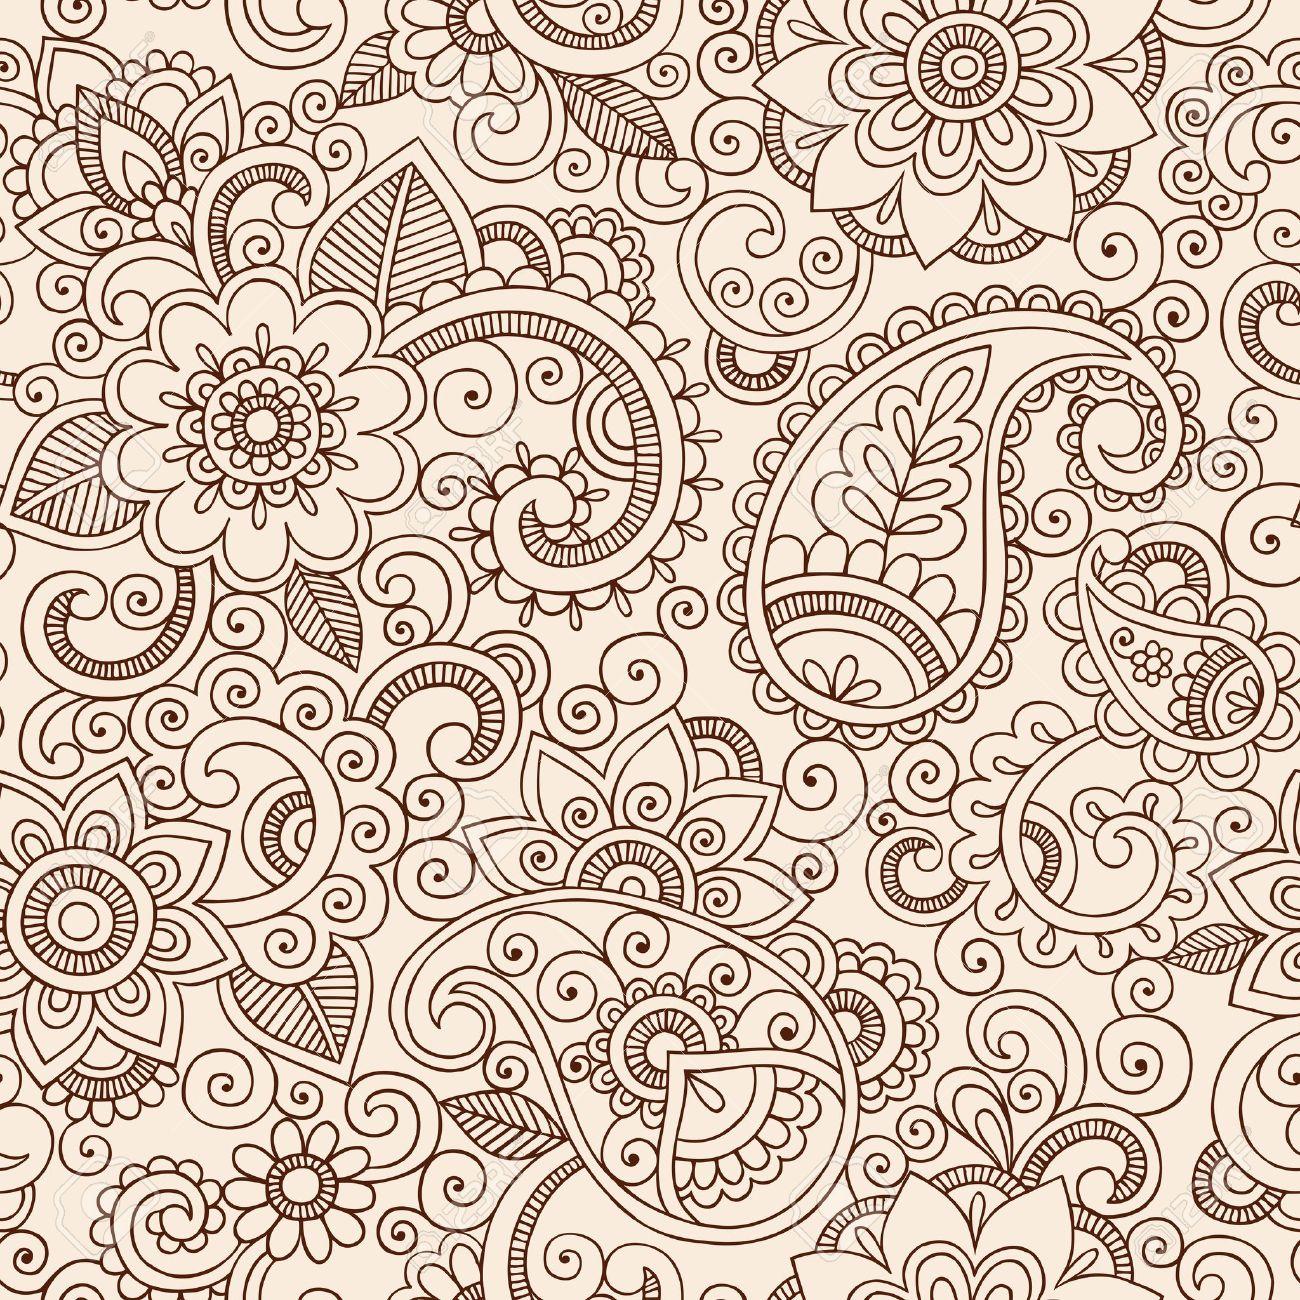 Henna Mehndi Tattoo Doodles Seamless Pattern- Paisley Flowers Vector Illustration Design Elements Stock Vector - 17164985